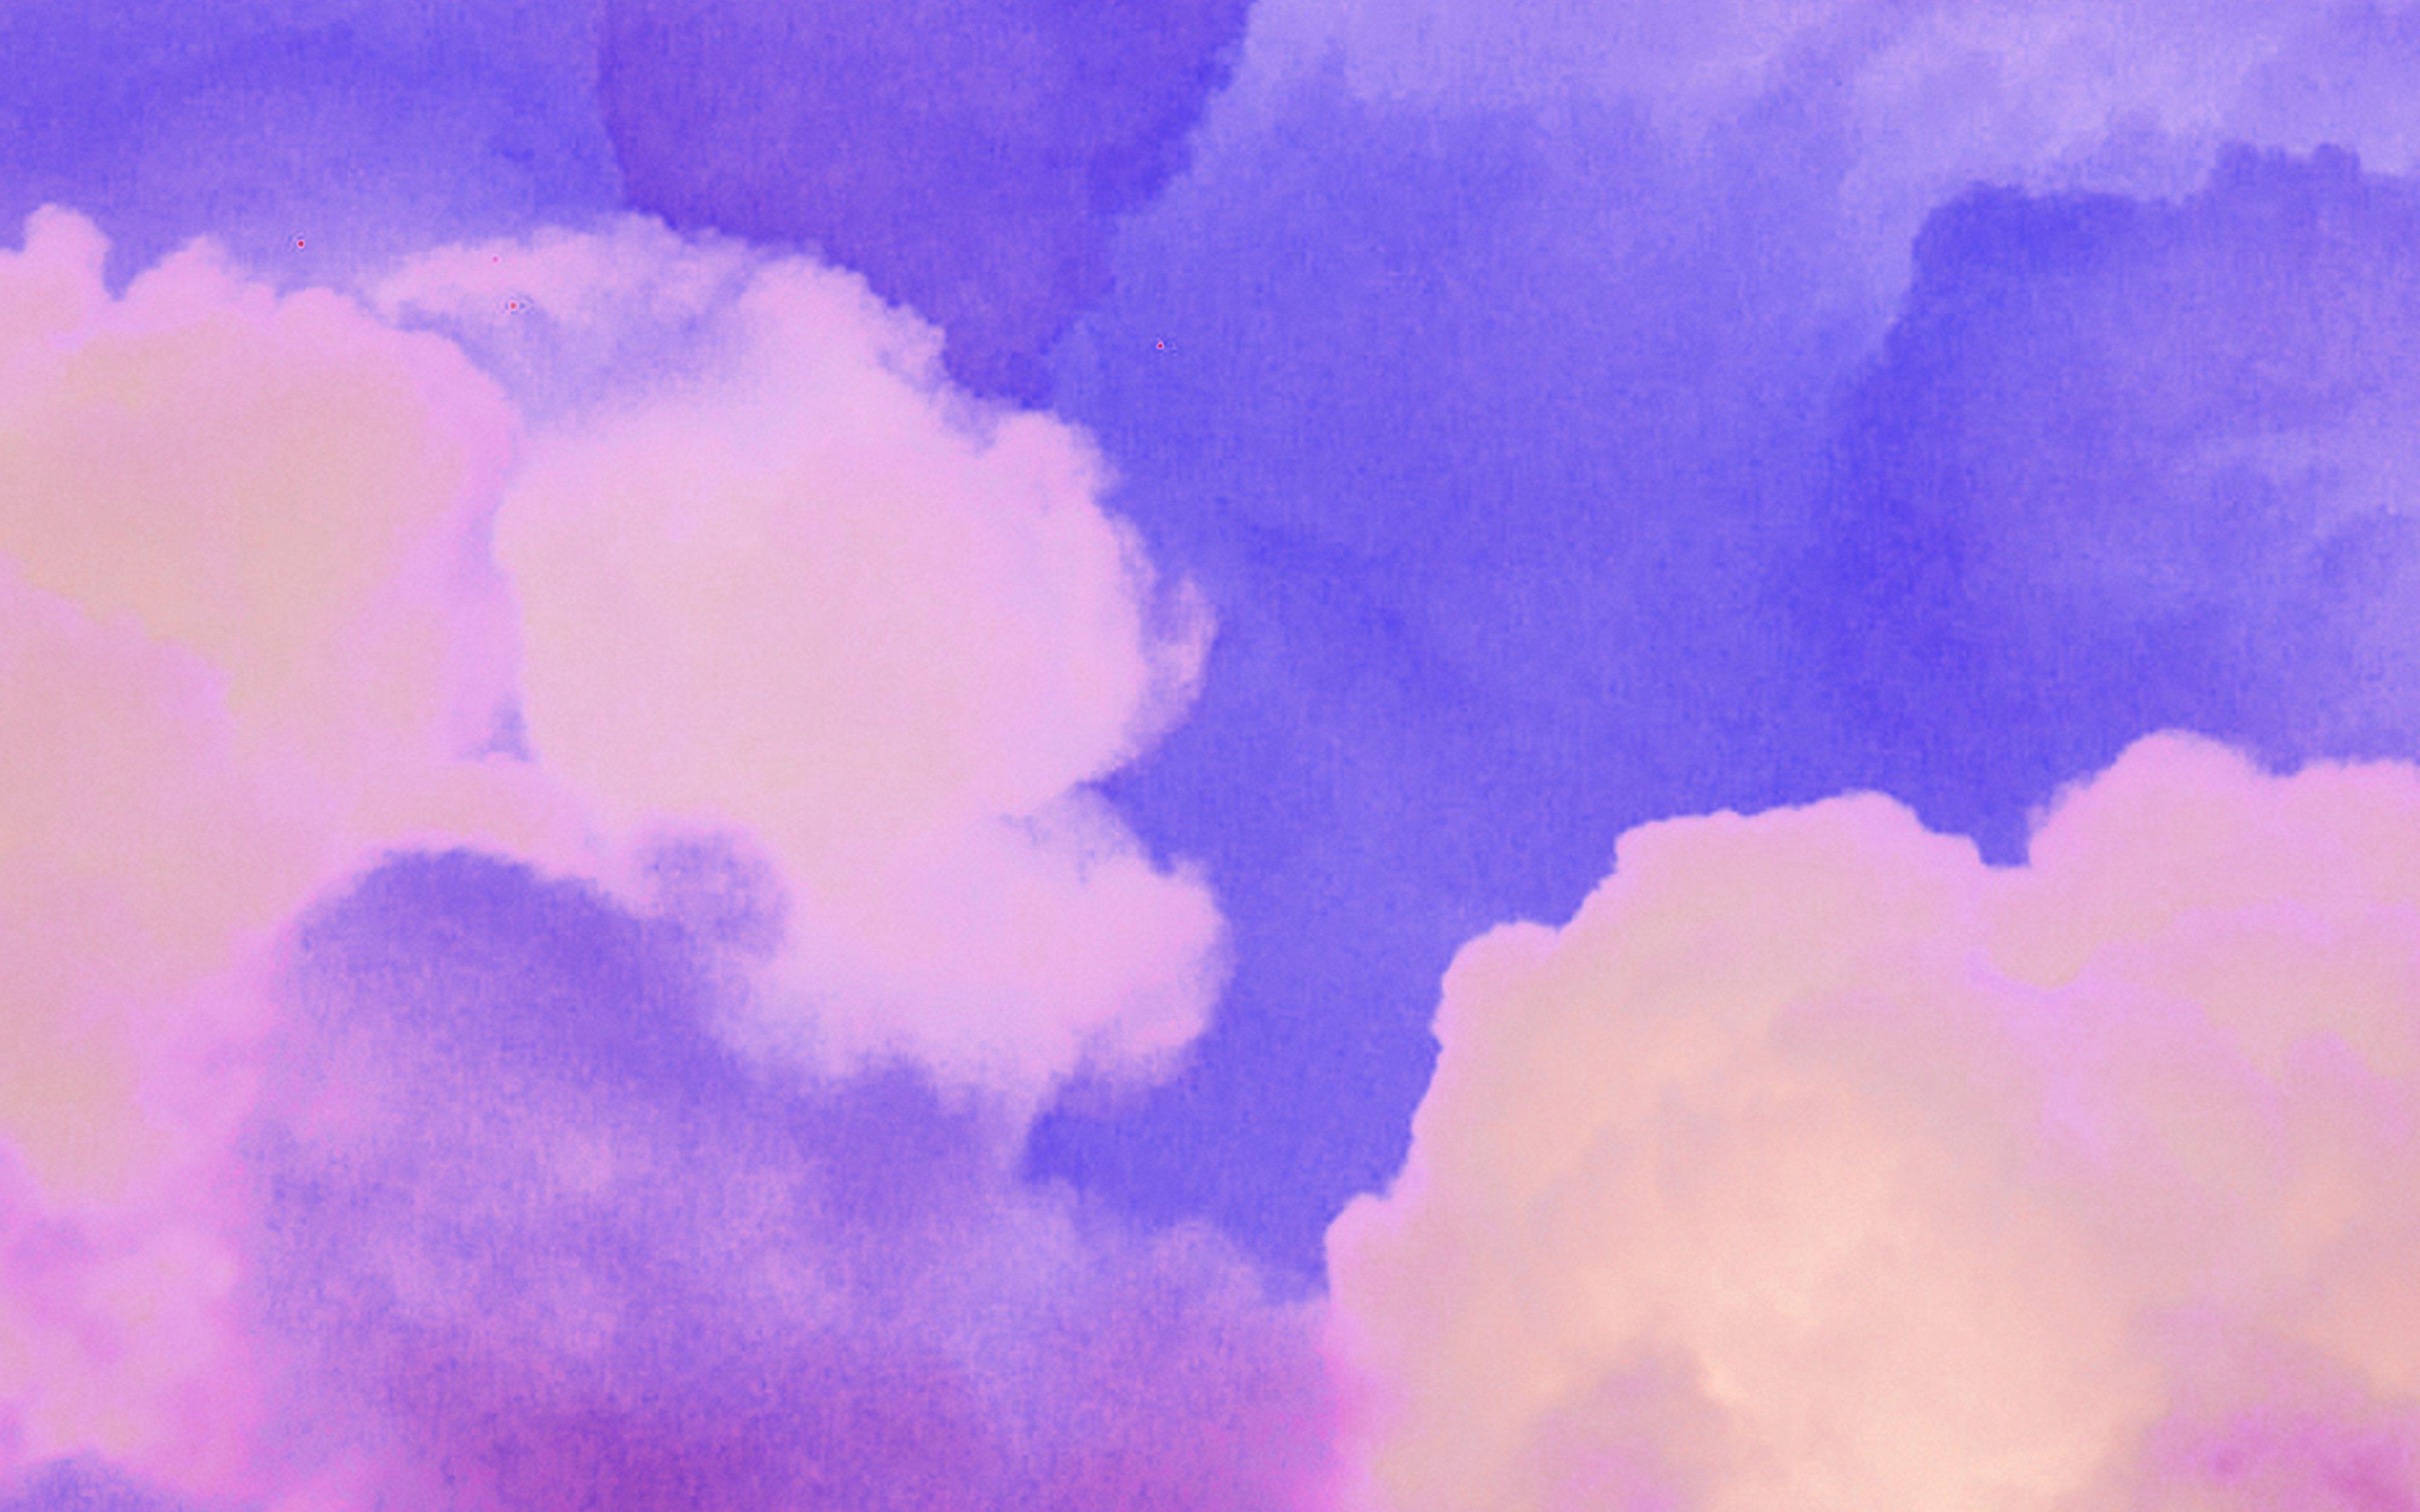 Fondos de pantalla Nubes moradas